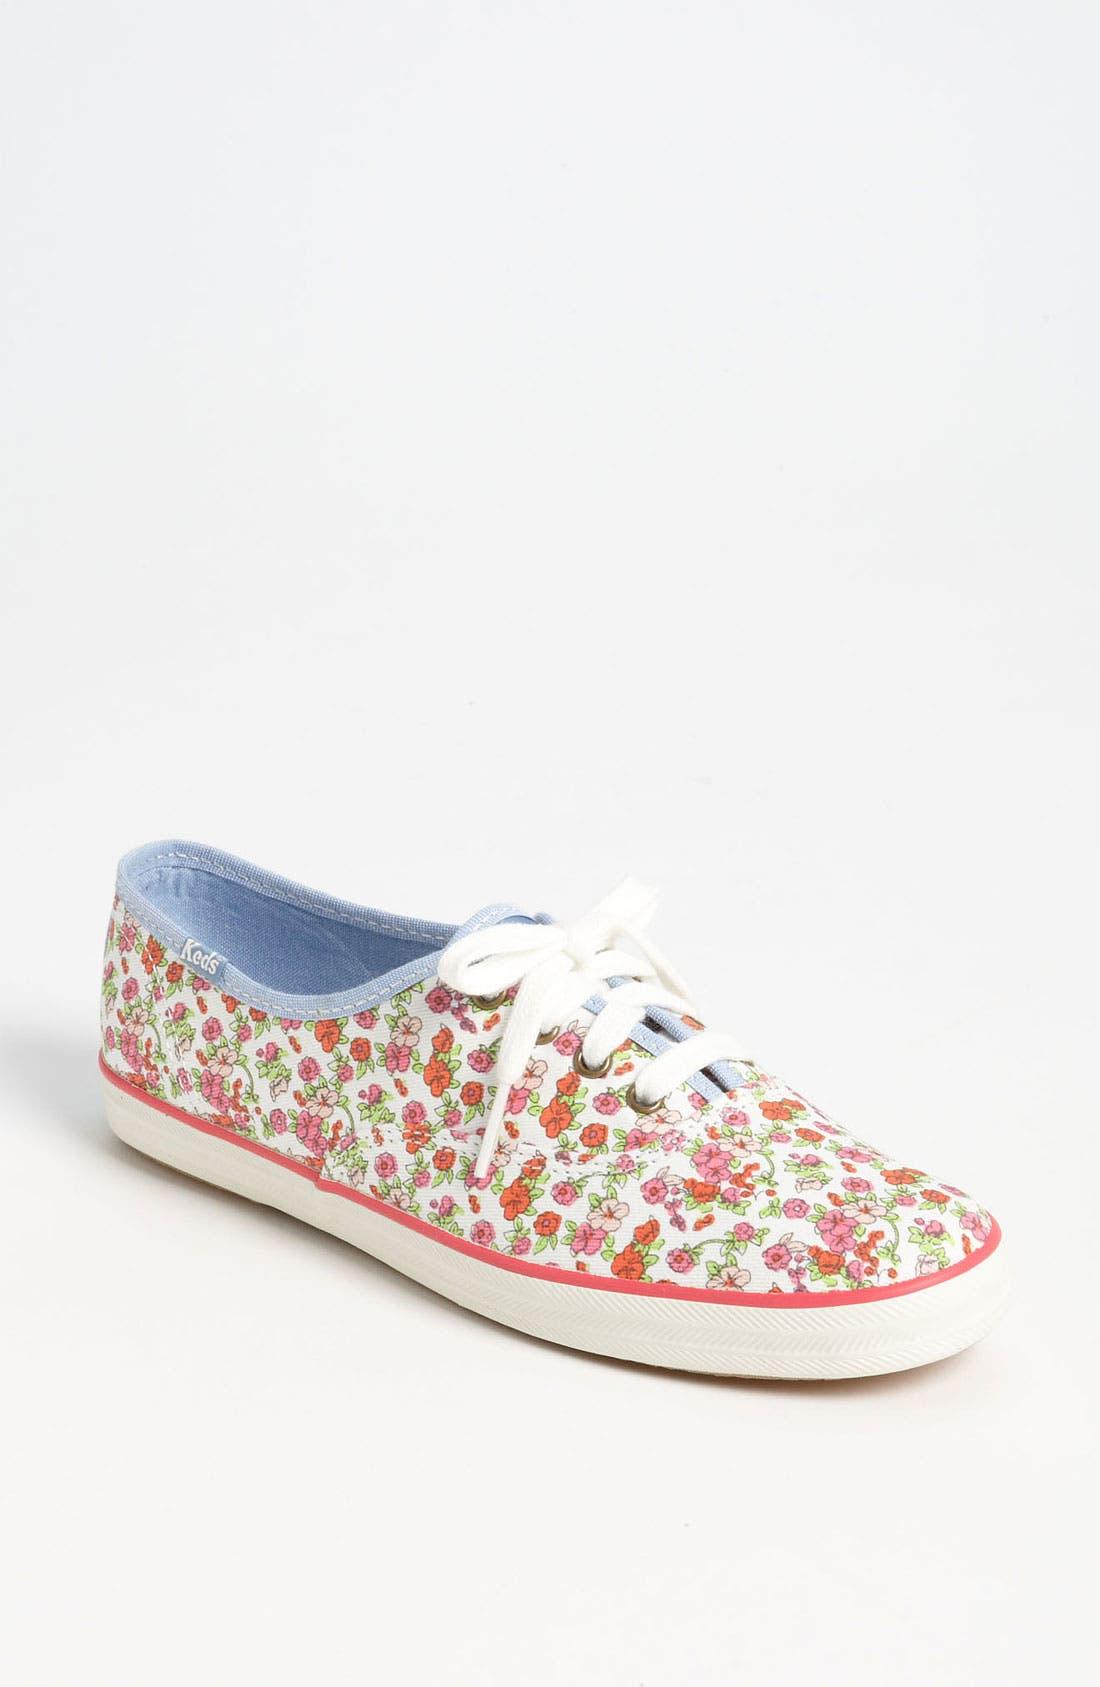 'Champion - Floral' Sneaker, Main, color, 100